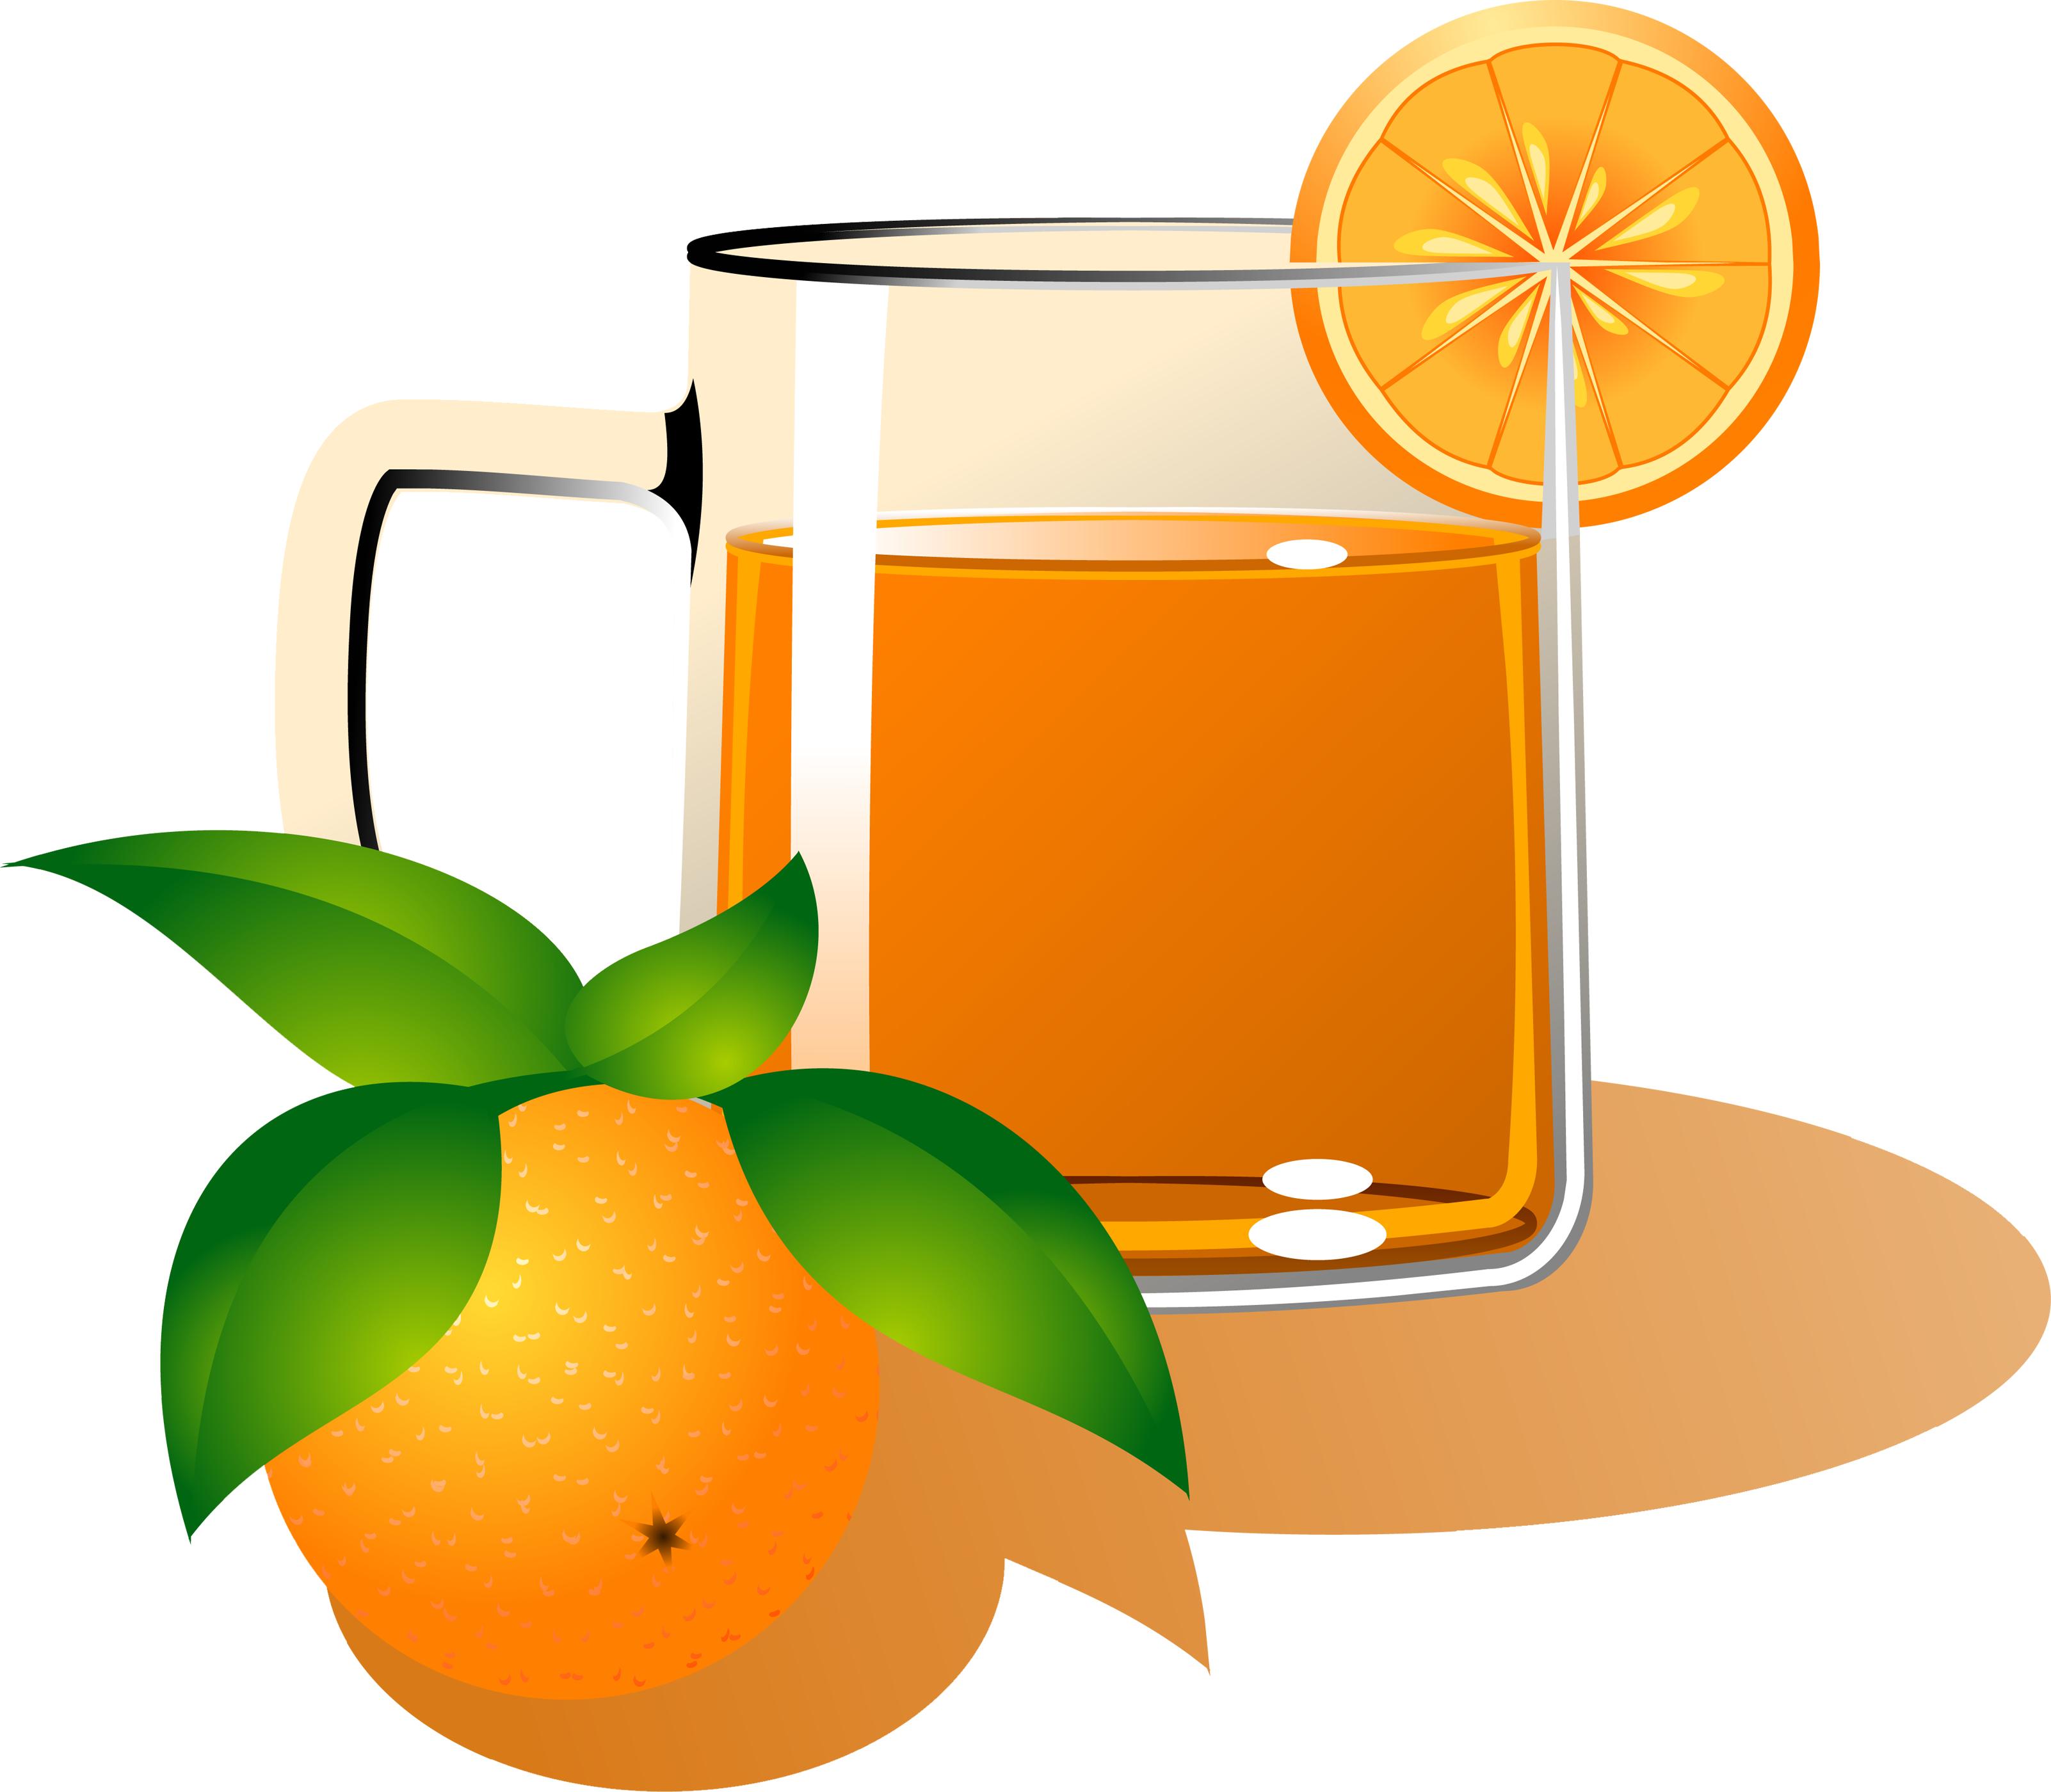 Clipart juice picture transparent download 36+ Orange Juice Clipart   ClipartLook picture transparent download